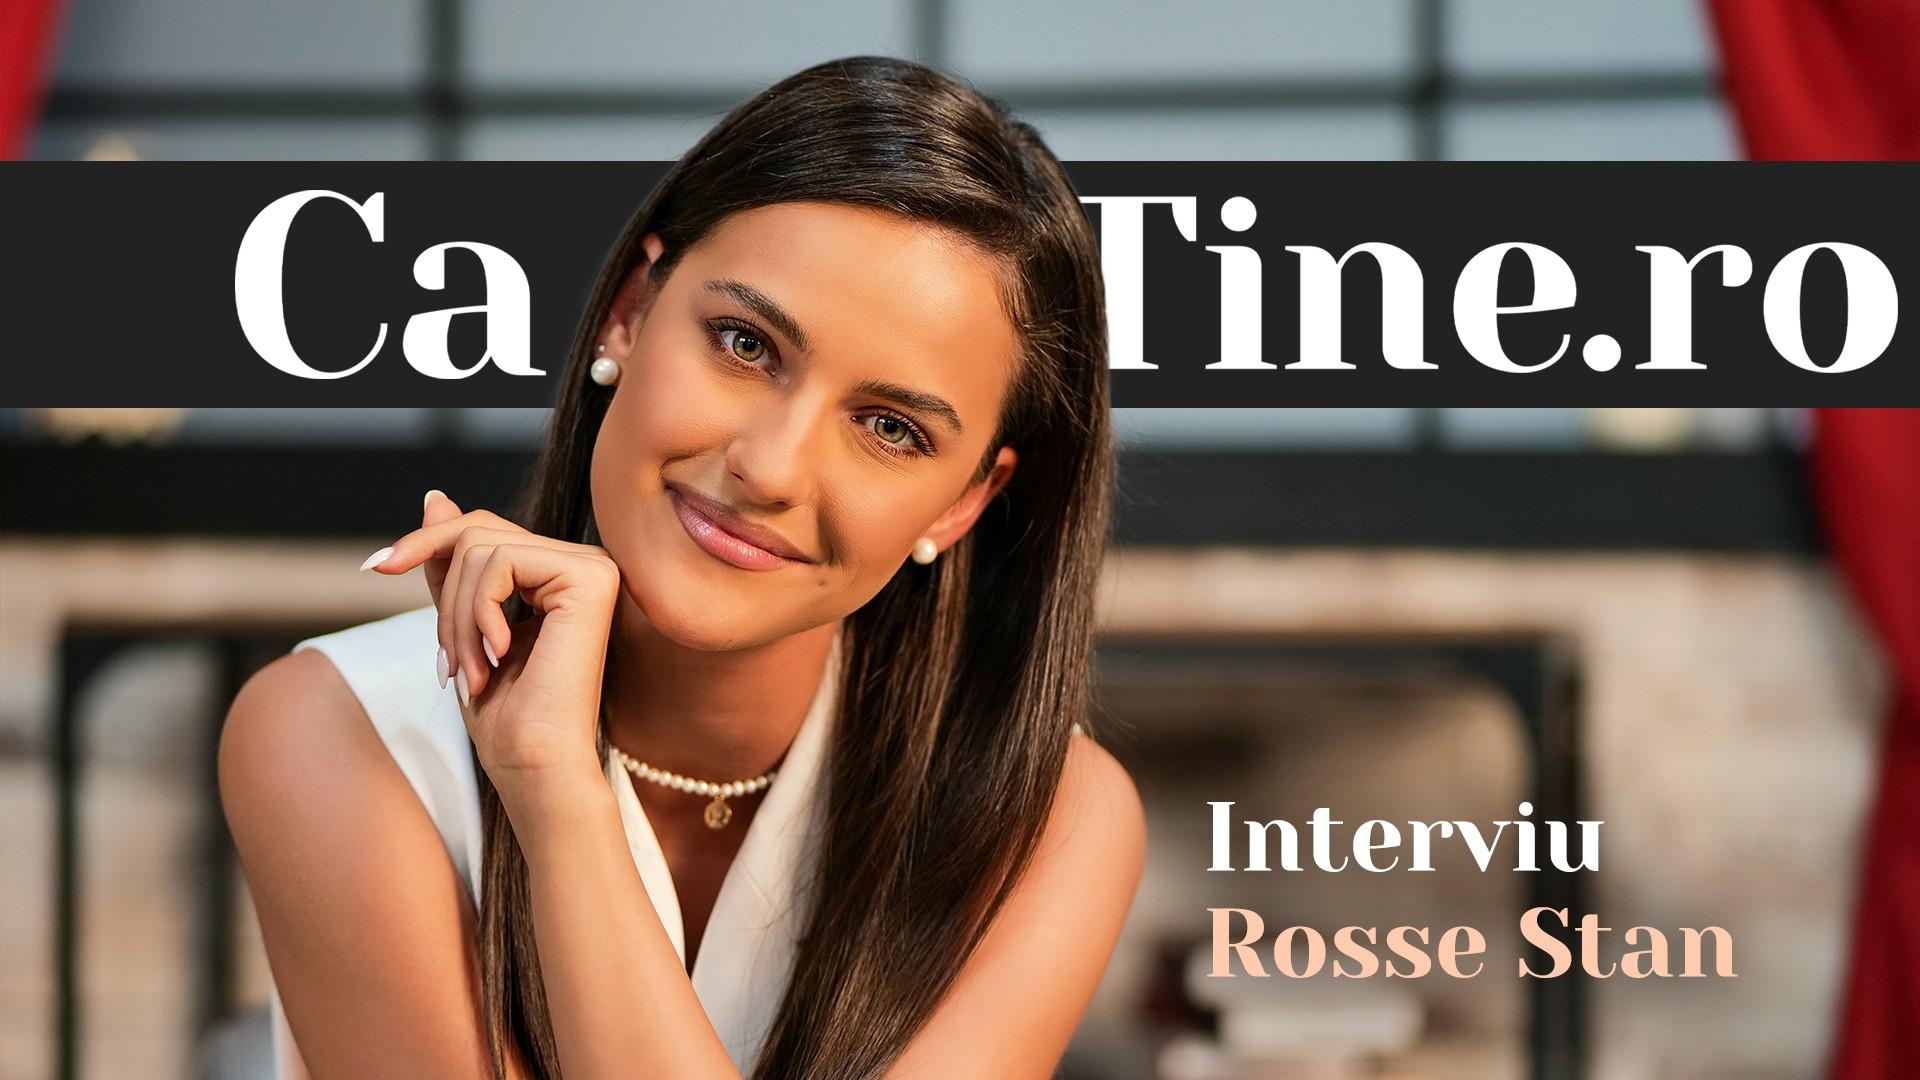 CaTine.ro - Interviu - Rosse Stan - Frumoasă